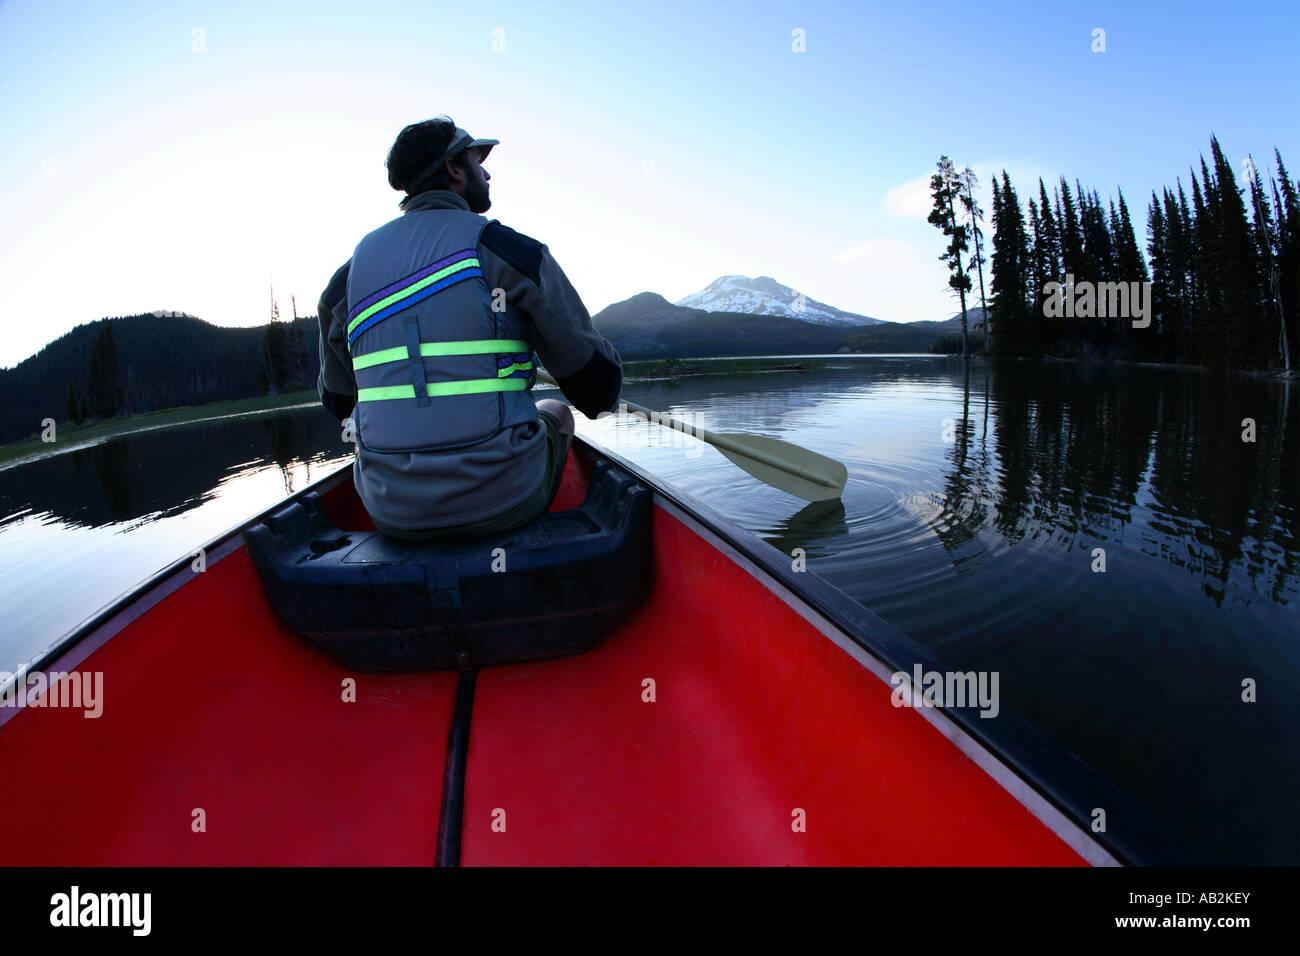 Man paddling canoe on lake - Stock Image